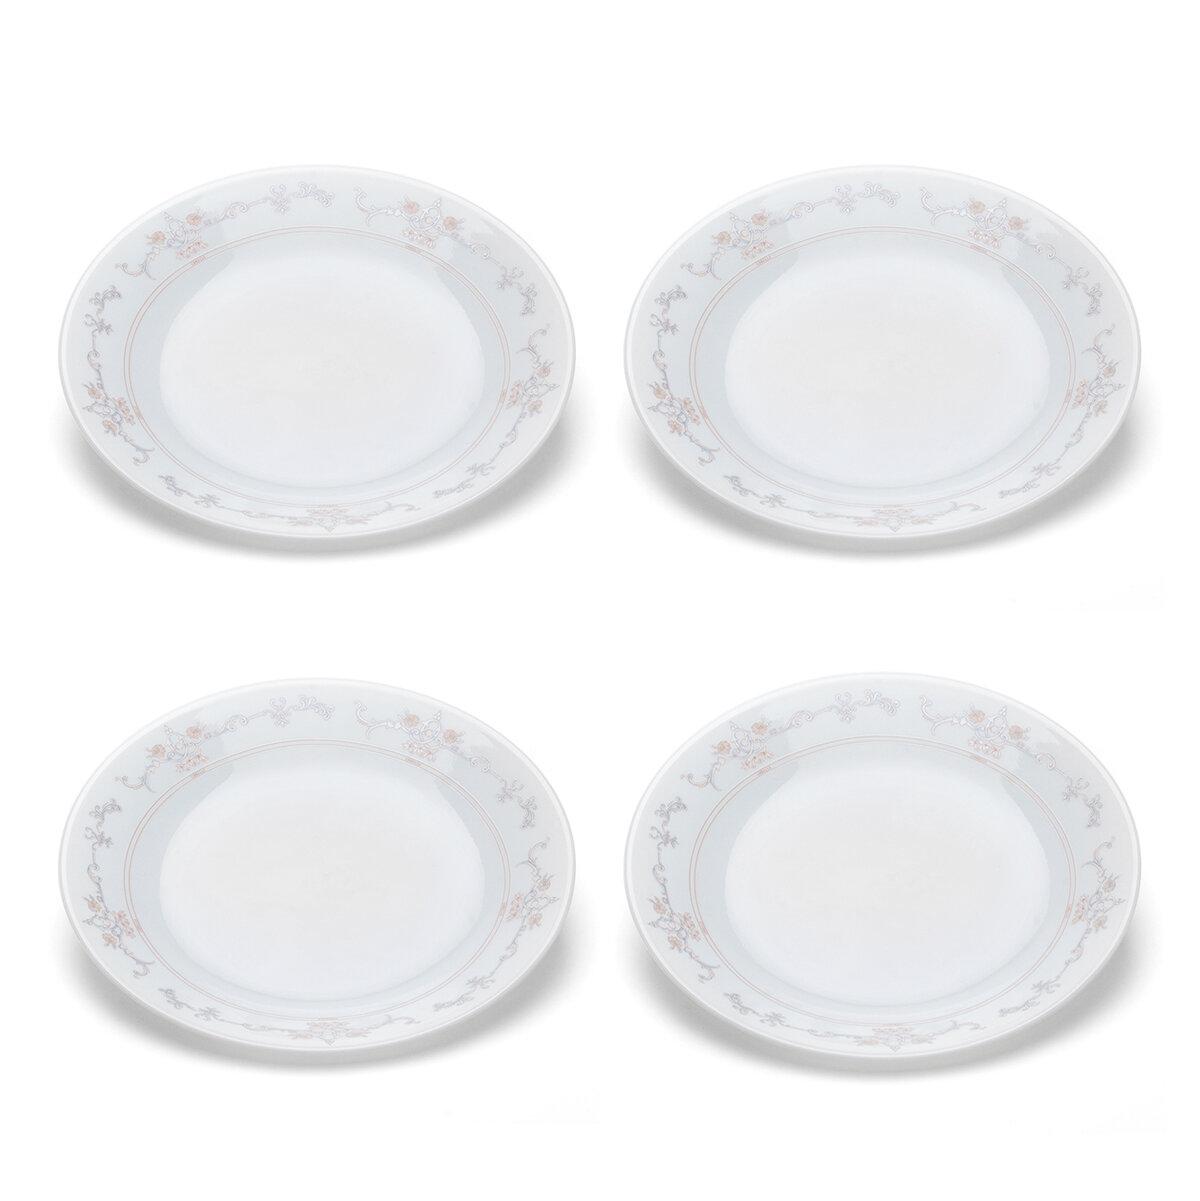 Bộ 4 đĩa thủy tinh Corelle 12CM 405-IM-LP